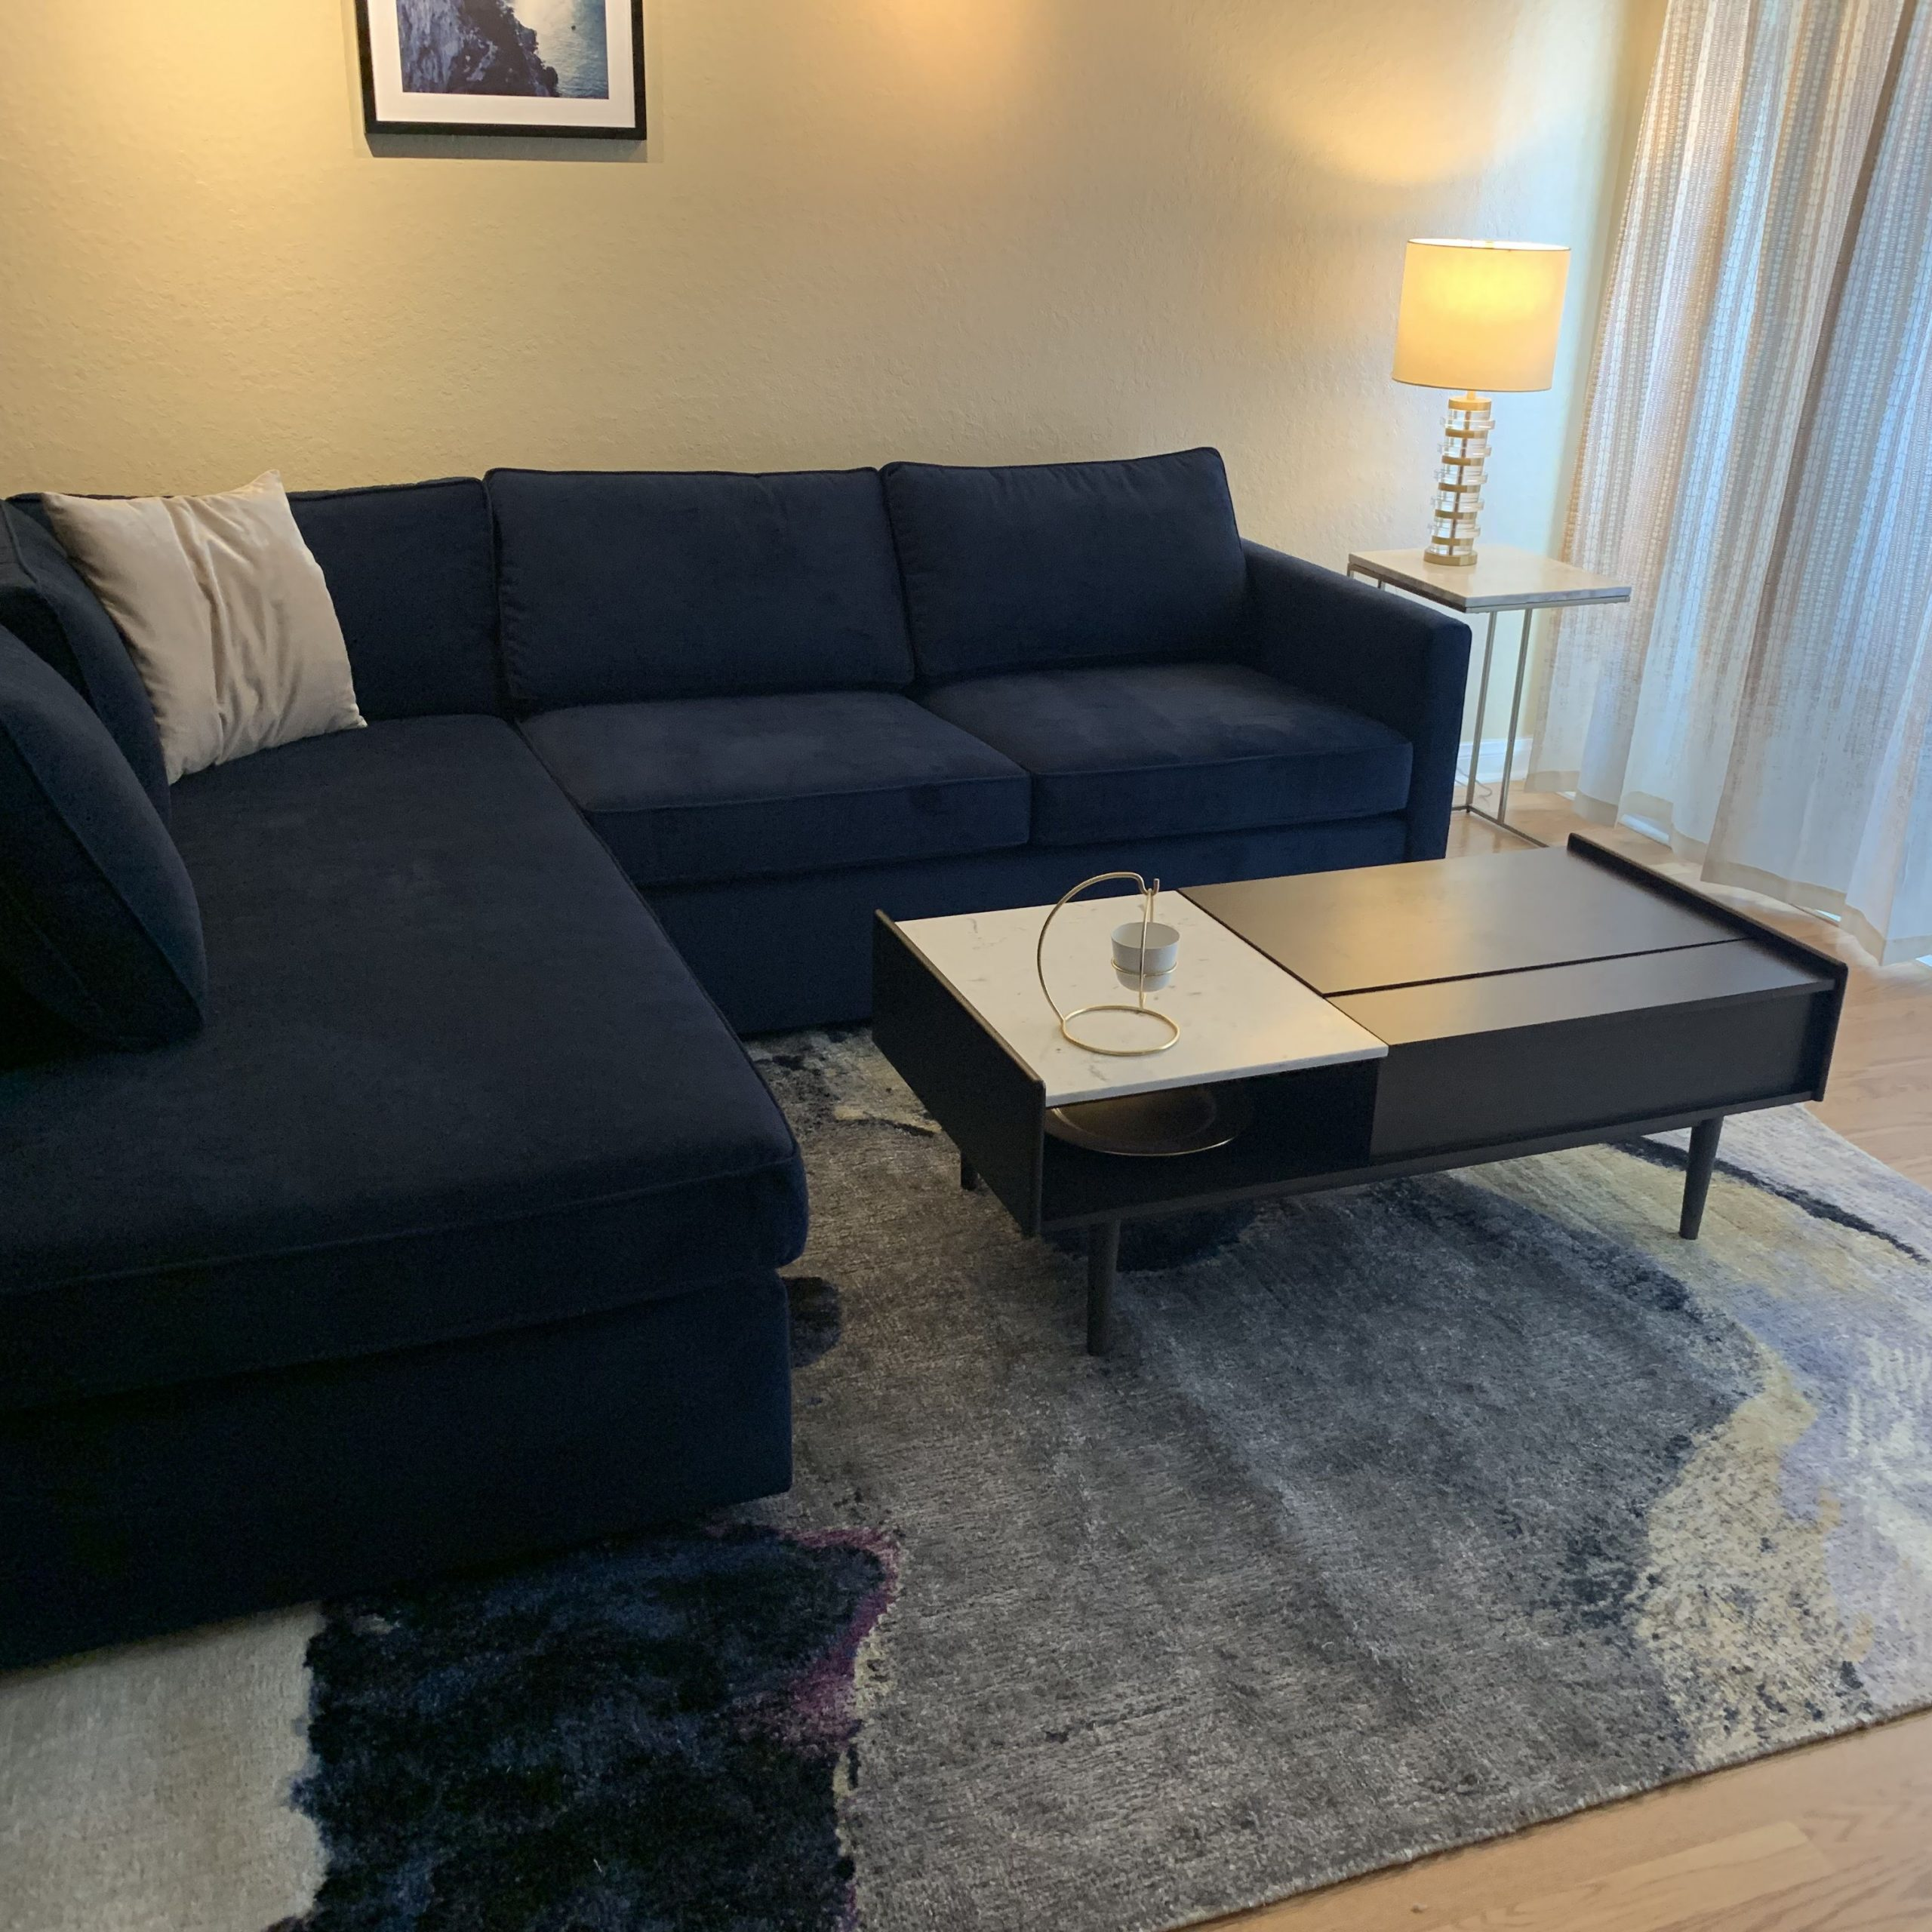 Dulce Mid Century Chaise Sofas Dark Blue Inside Trendy Velvet Couch Ink Blue Mid Century Modern (View 10 of 20)